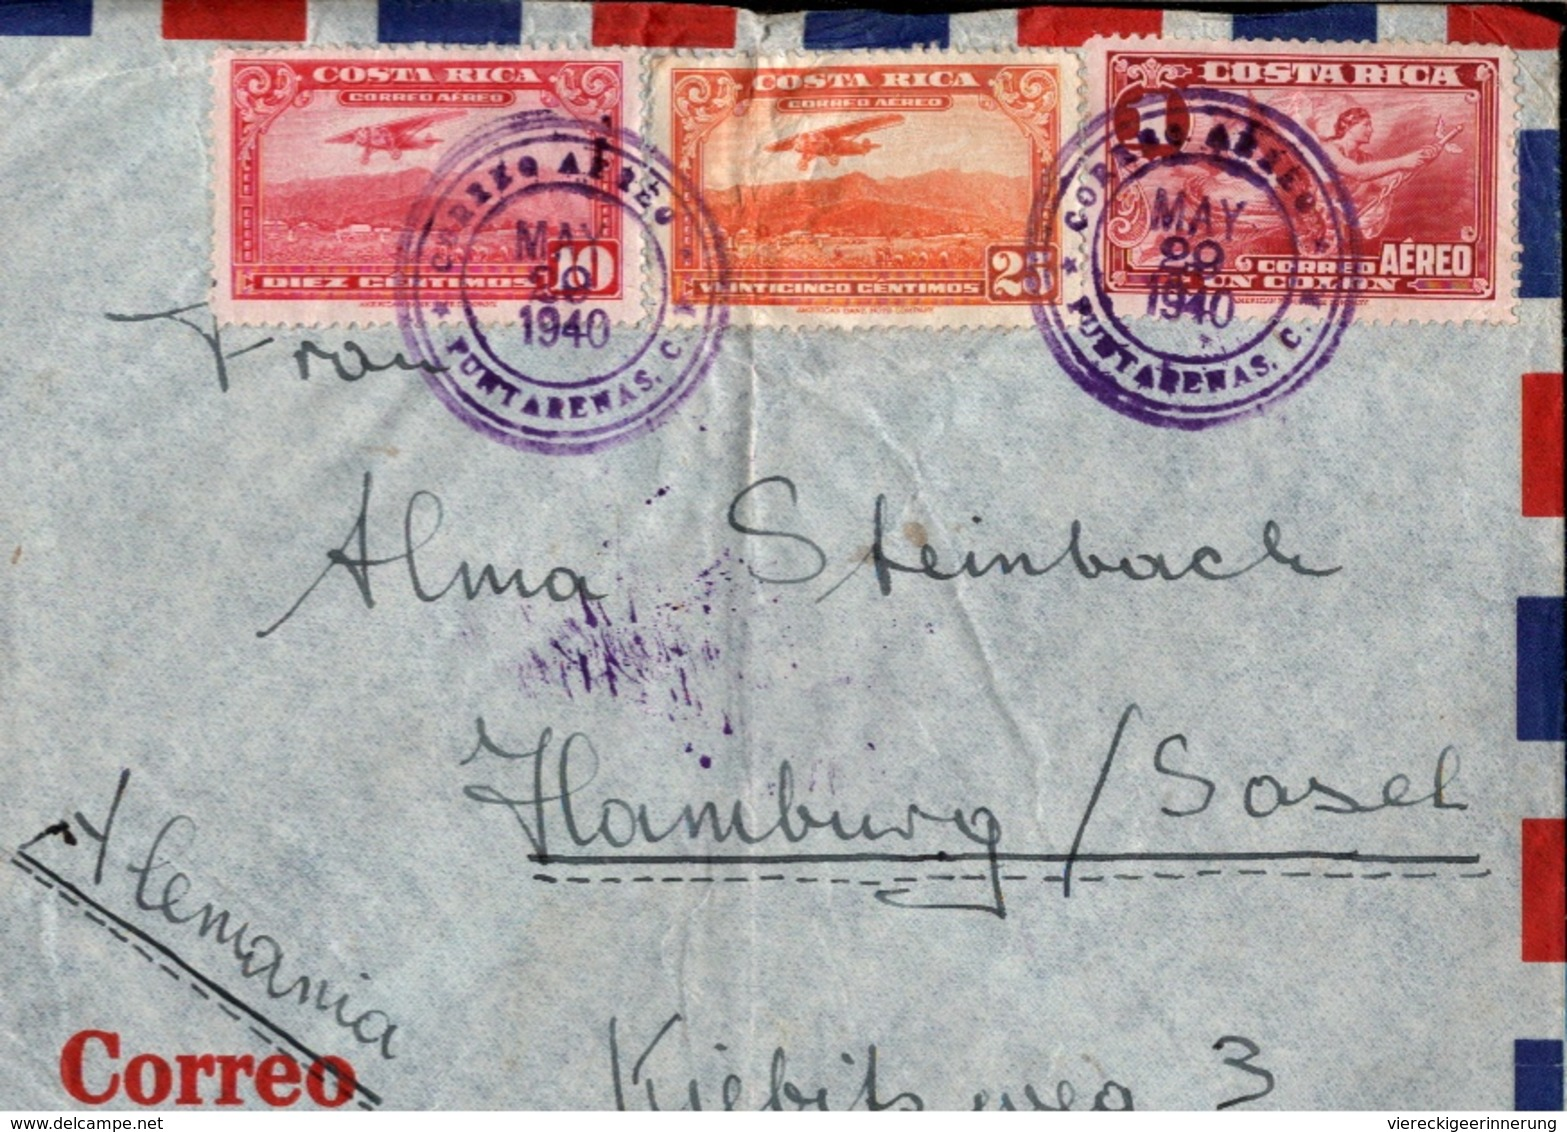 ! 1940 Costa Rica Luftpostbrief Air Mail, Punta Arenas, Por Avion, Aerea, Hamburg Sasel, OKW Zensur, Censure, Censor - Costa Rica